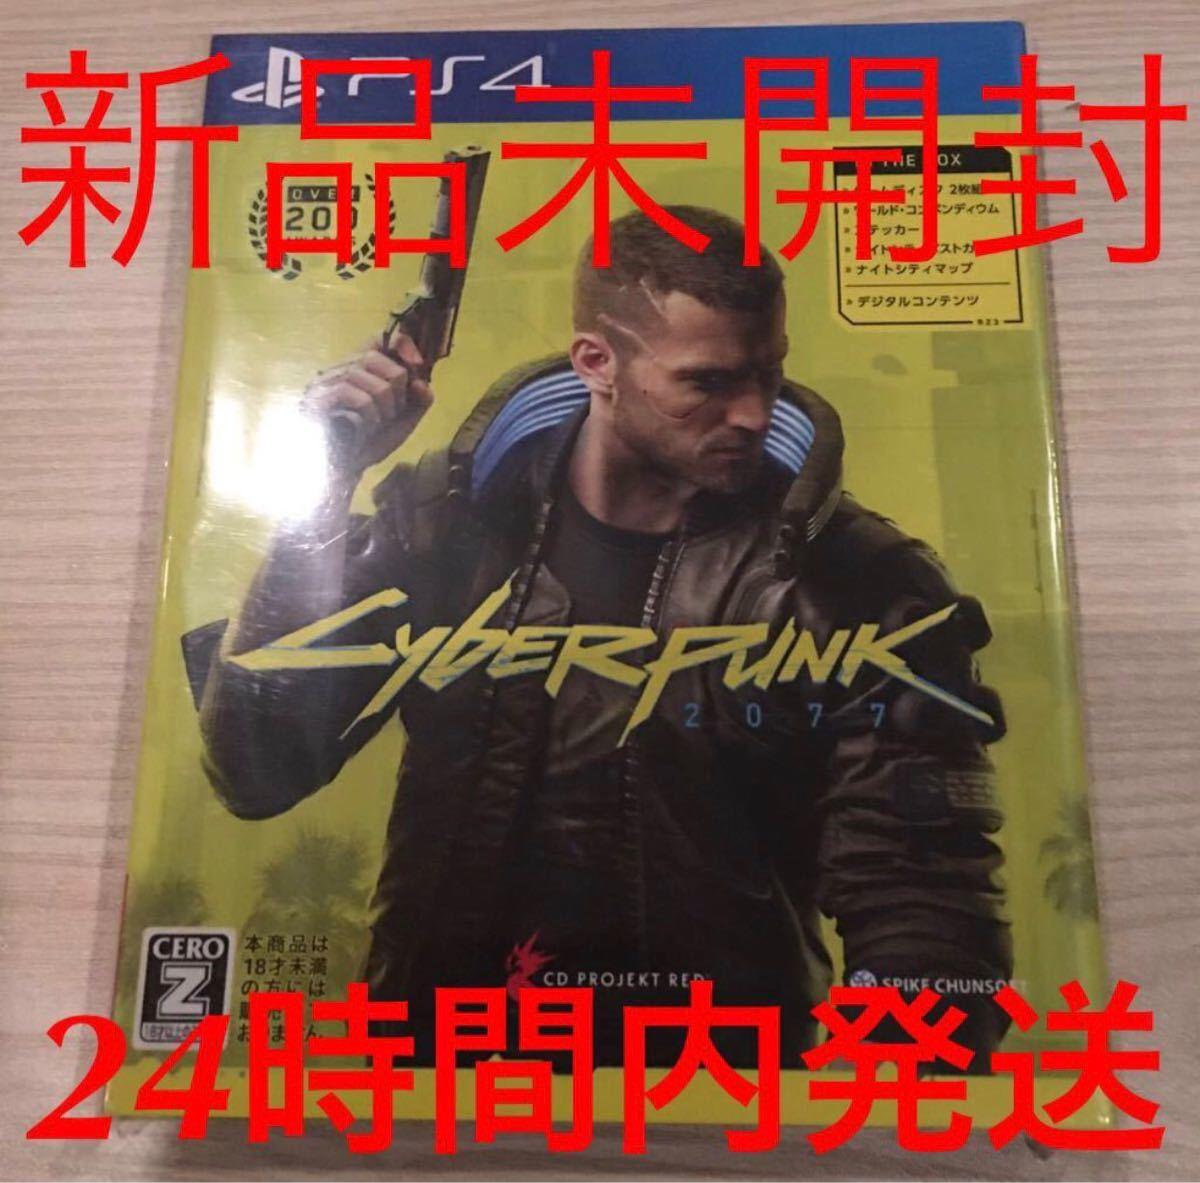 PS4 サイバーパンク 2077 IN THE BOX 新品未開封